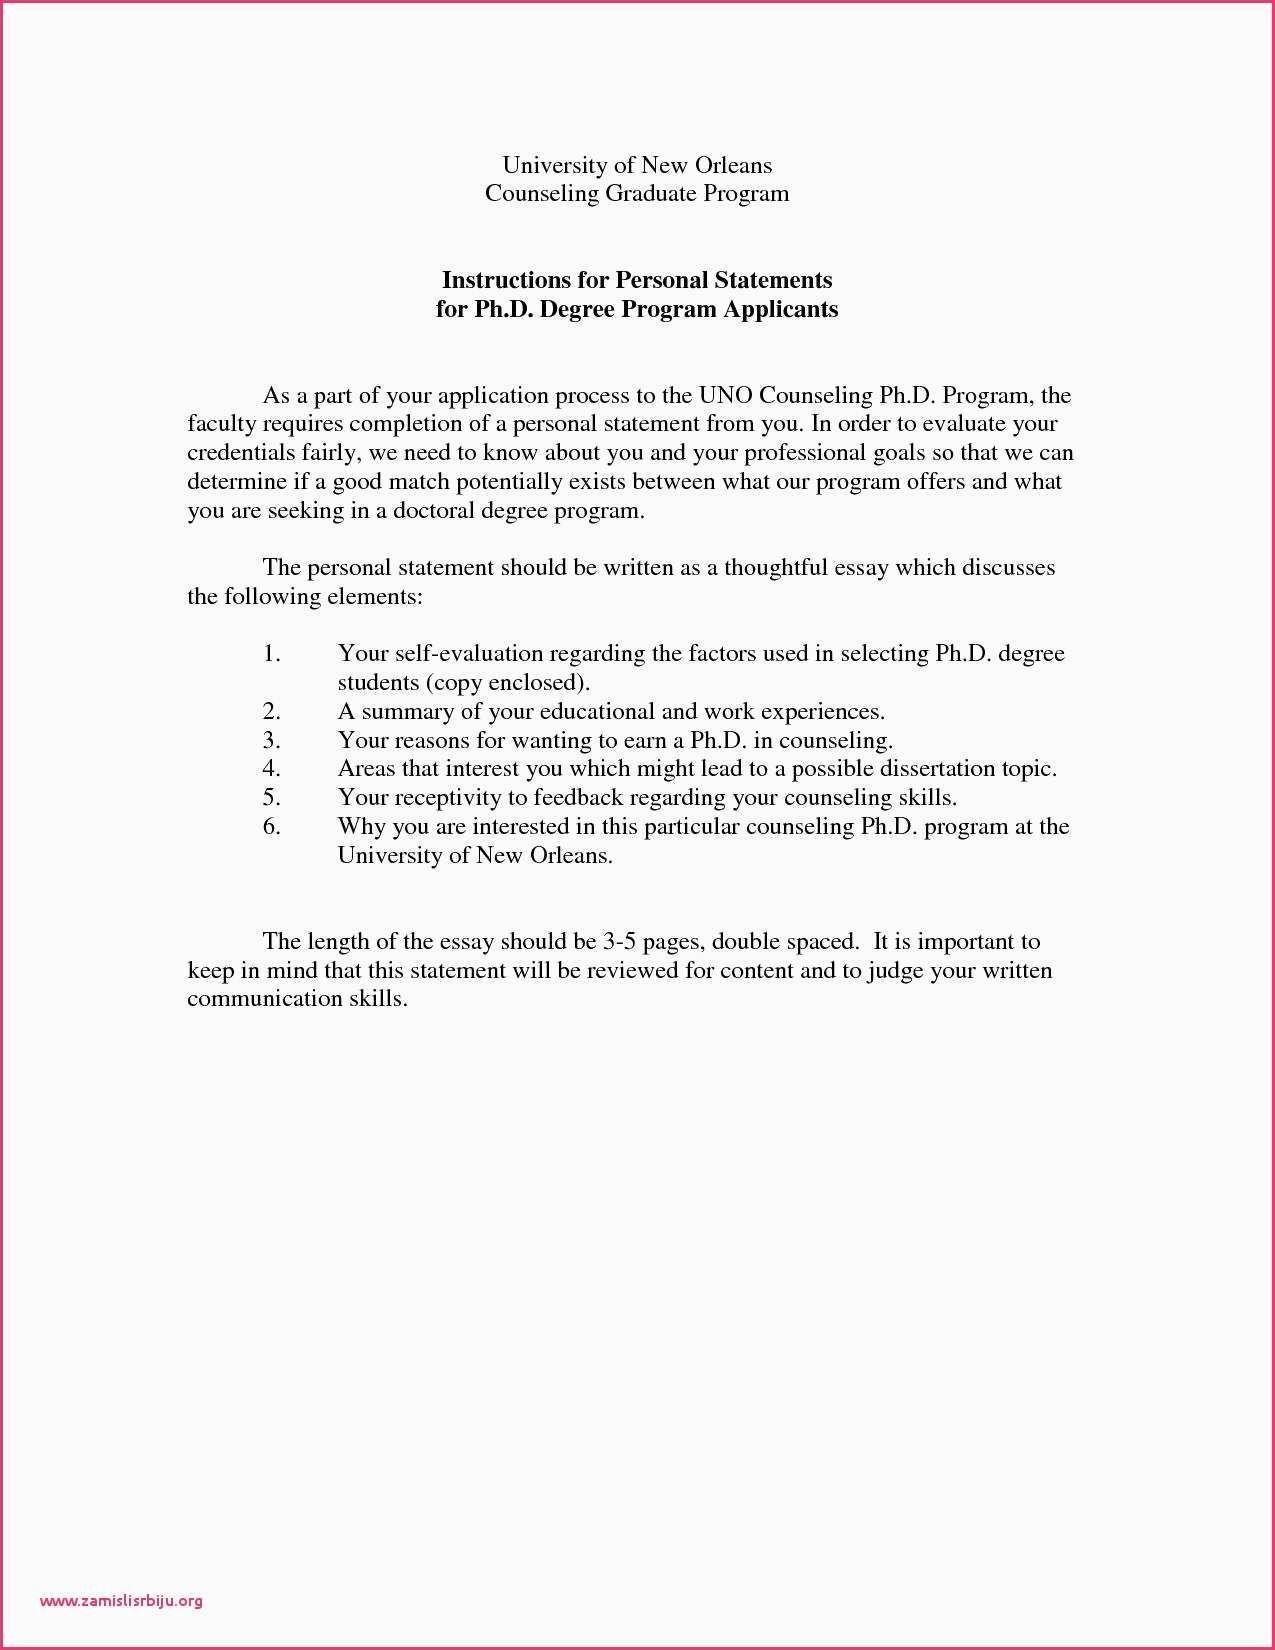 Master's in English Thesis Topics - GradSchoolHub